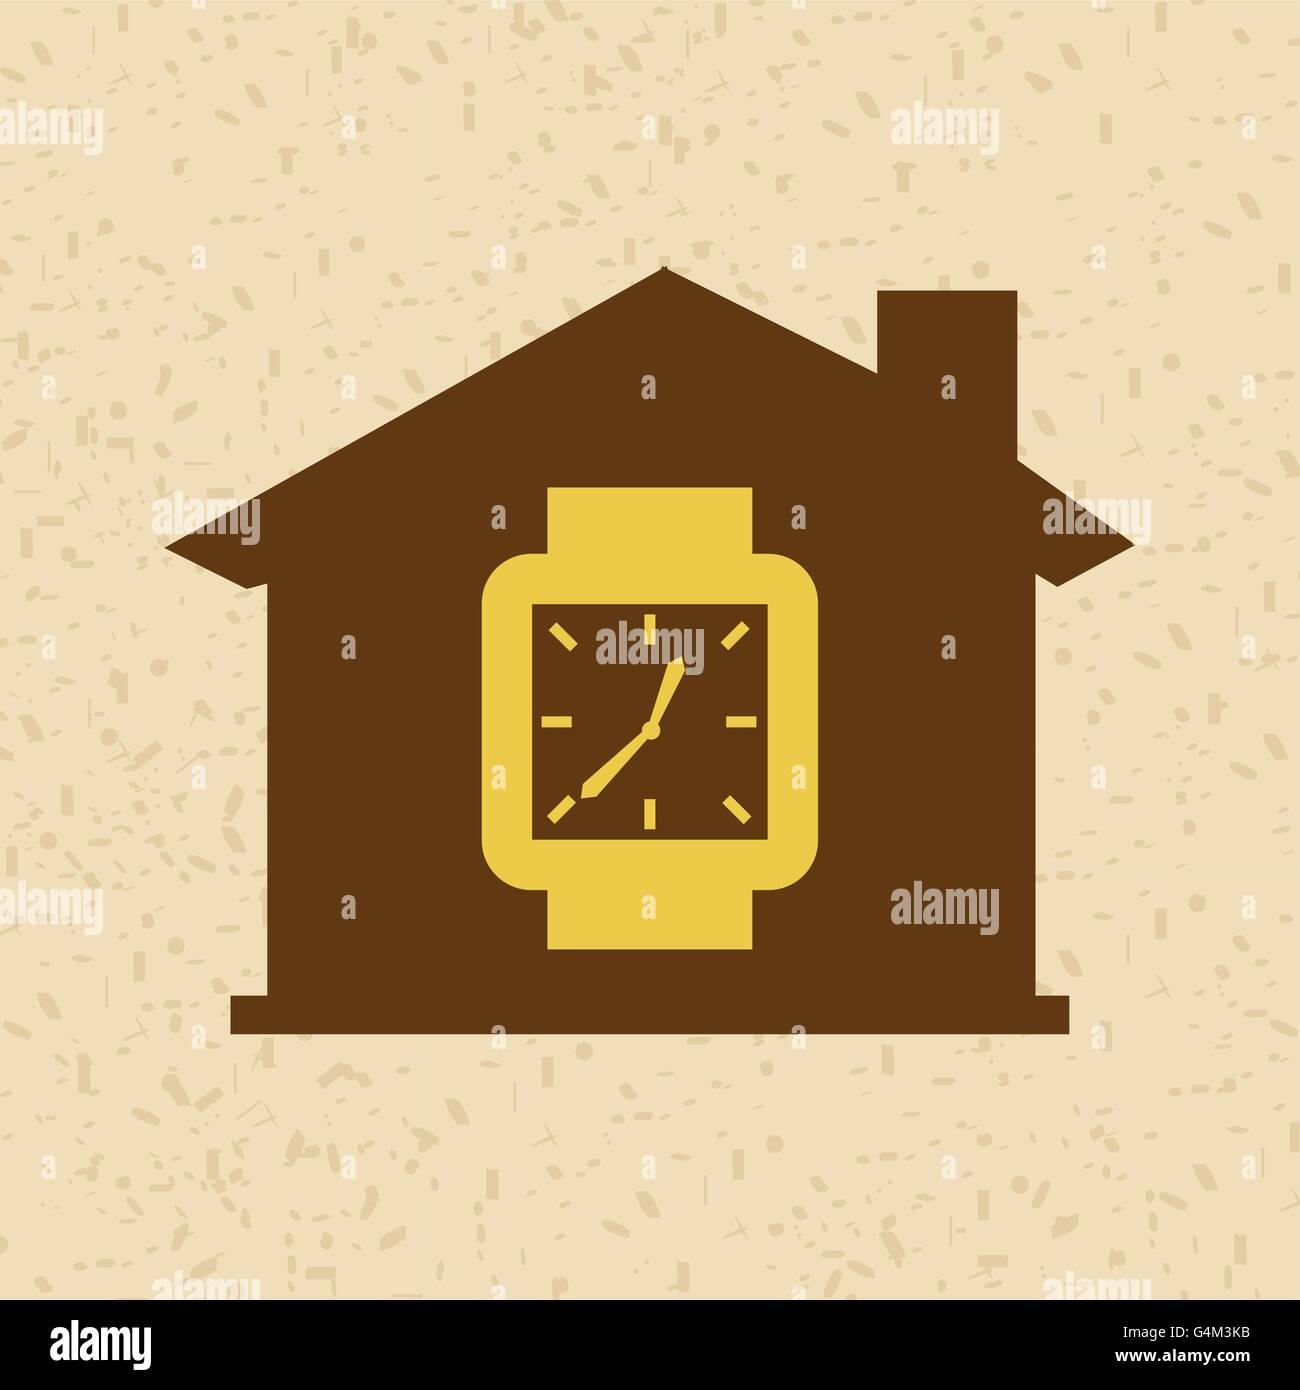 Home Depot Equipment Design Stock Vector Art Illustration Vector